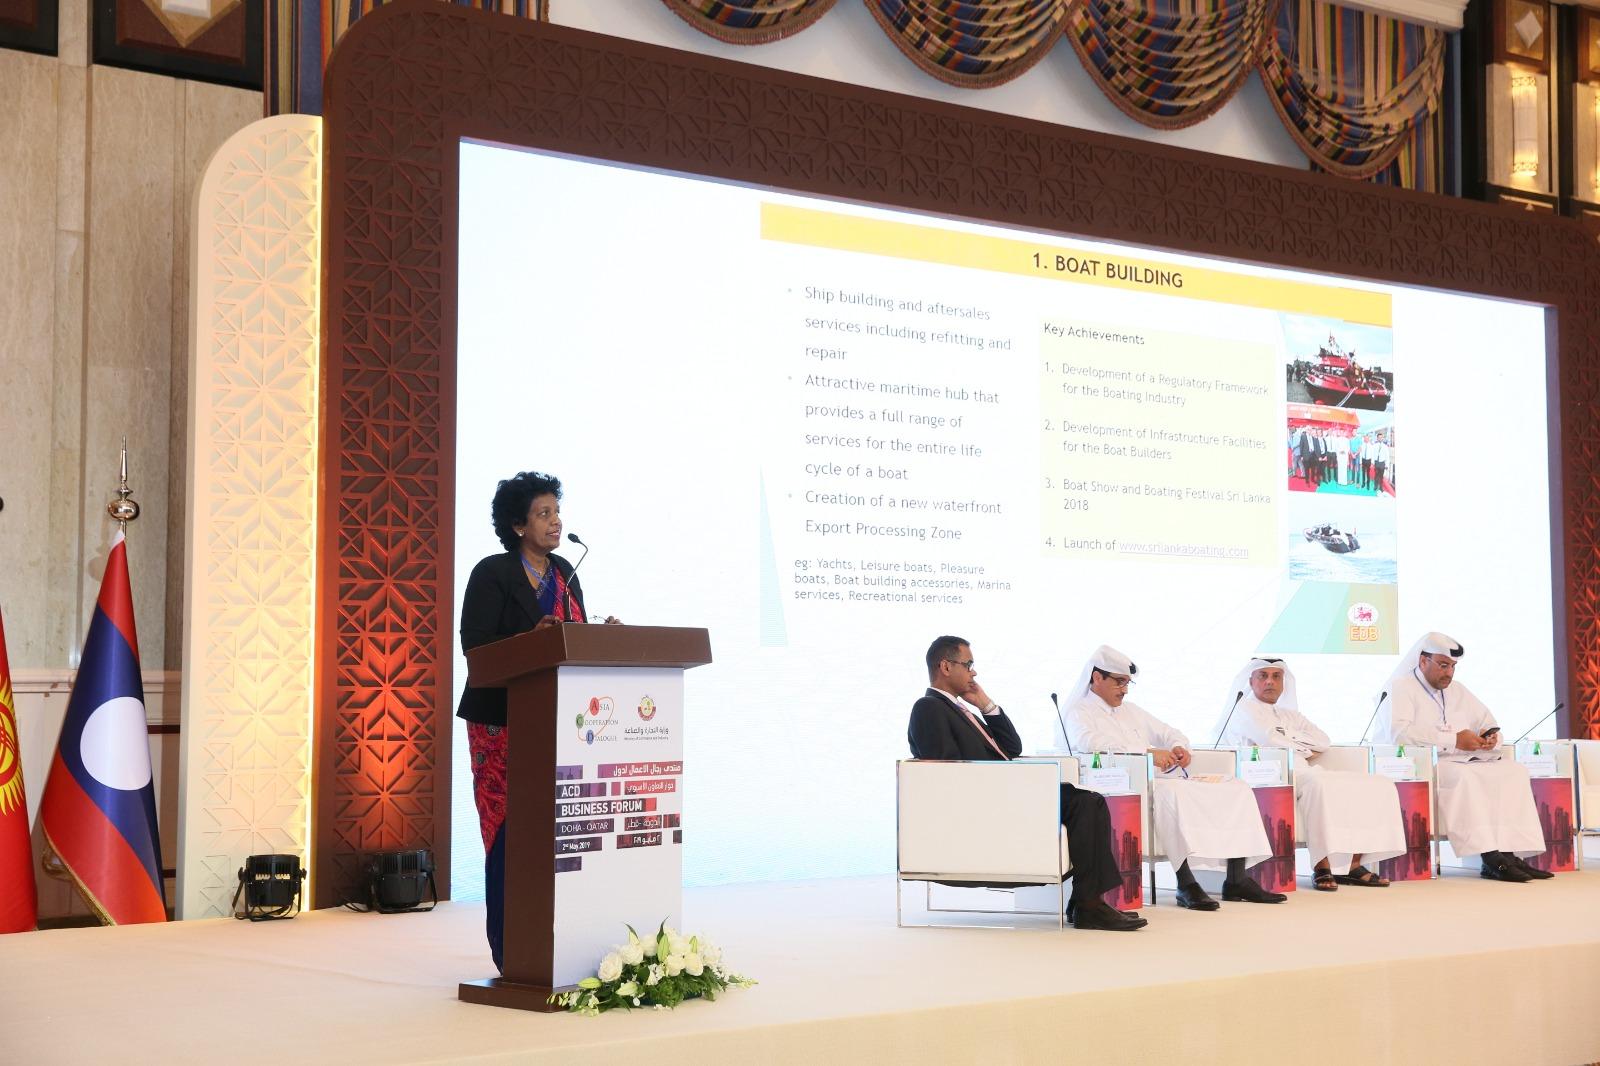 3. DG-EDB addressing the Business forum